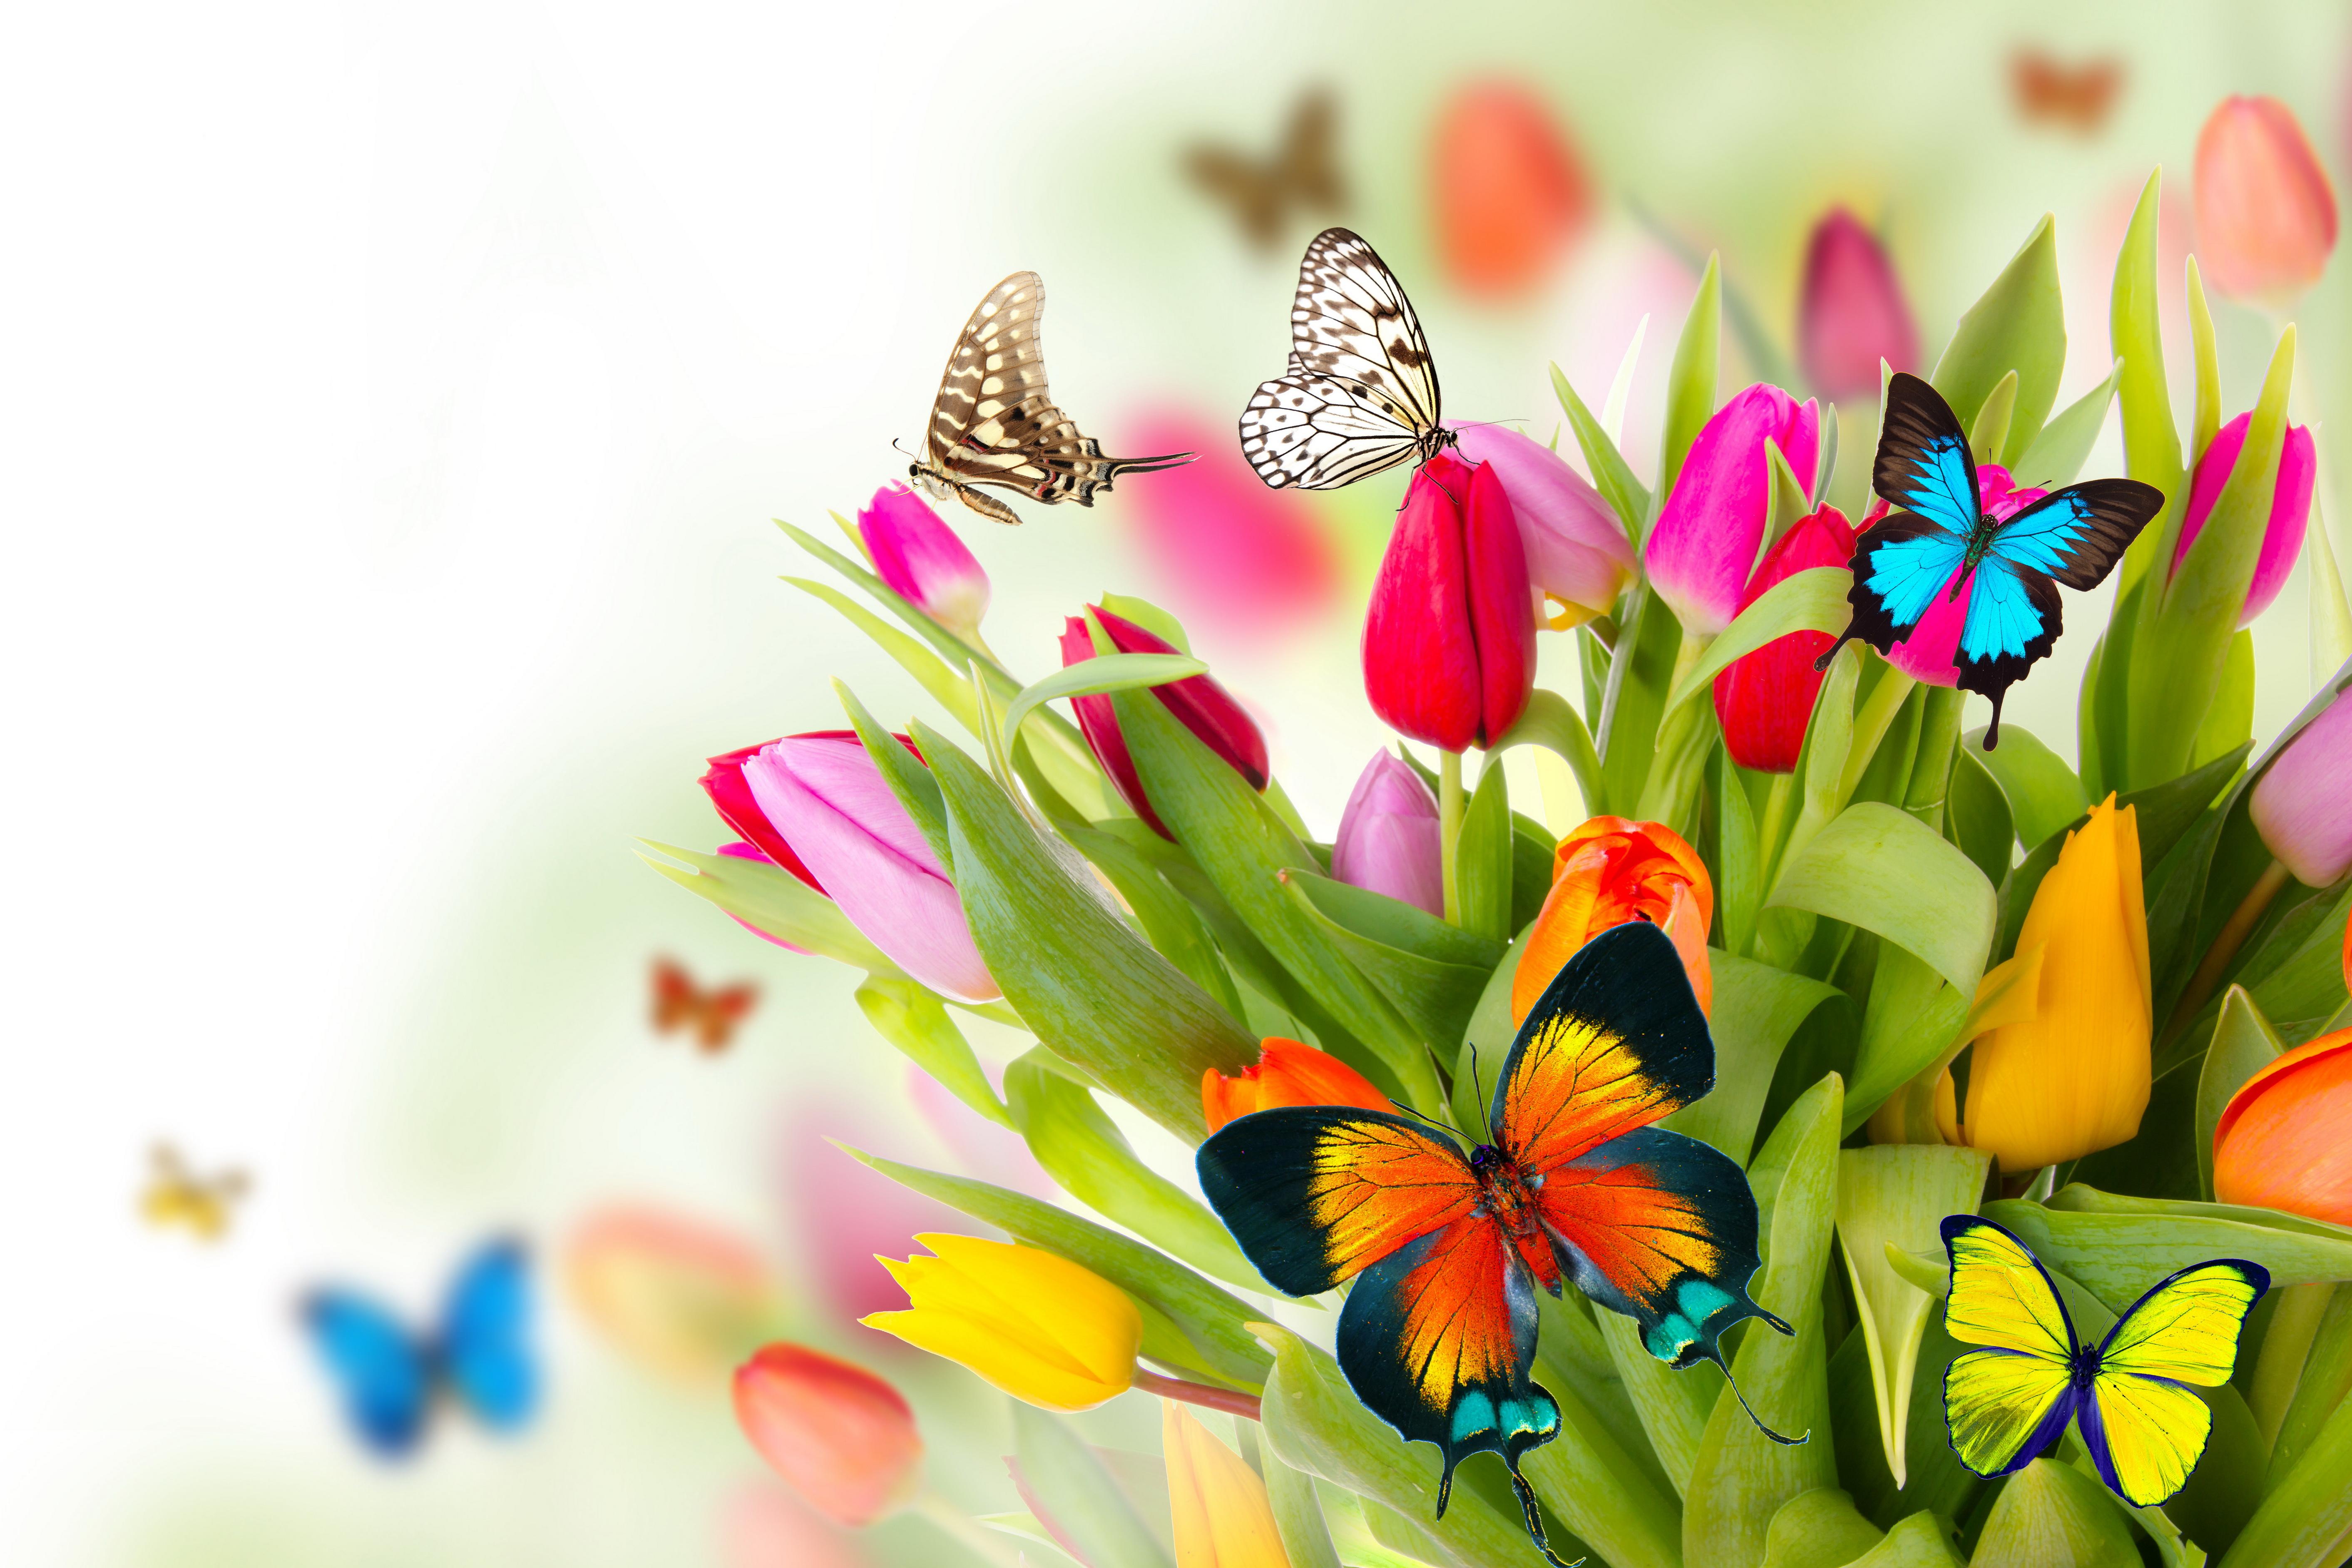 Spring Flowers Desktop Background Wallpapers Hd Free 498695